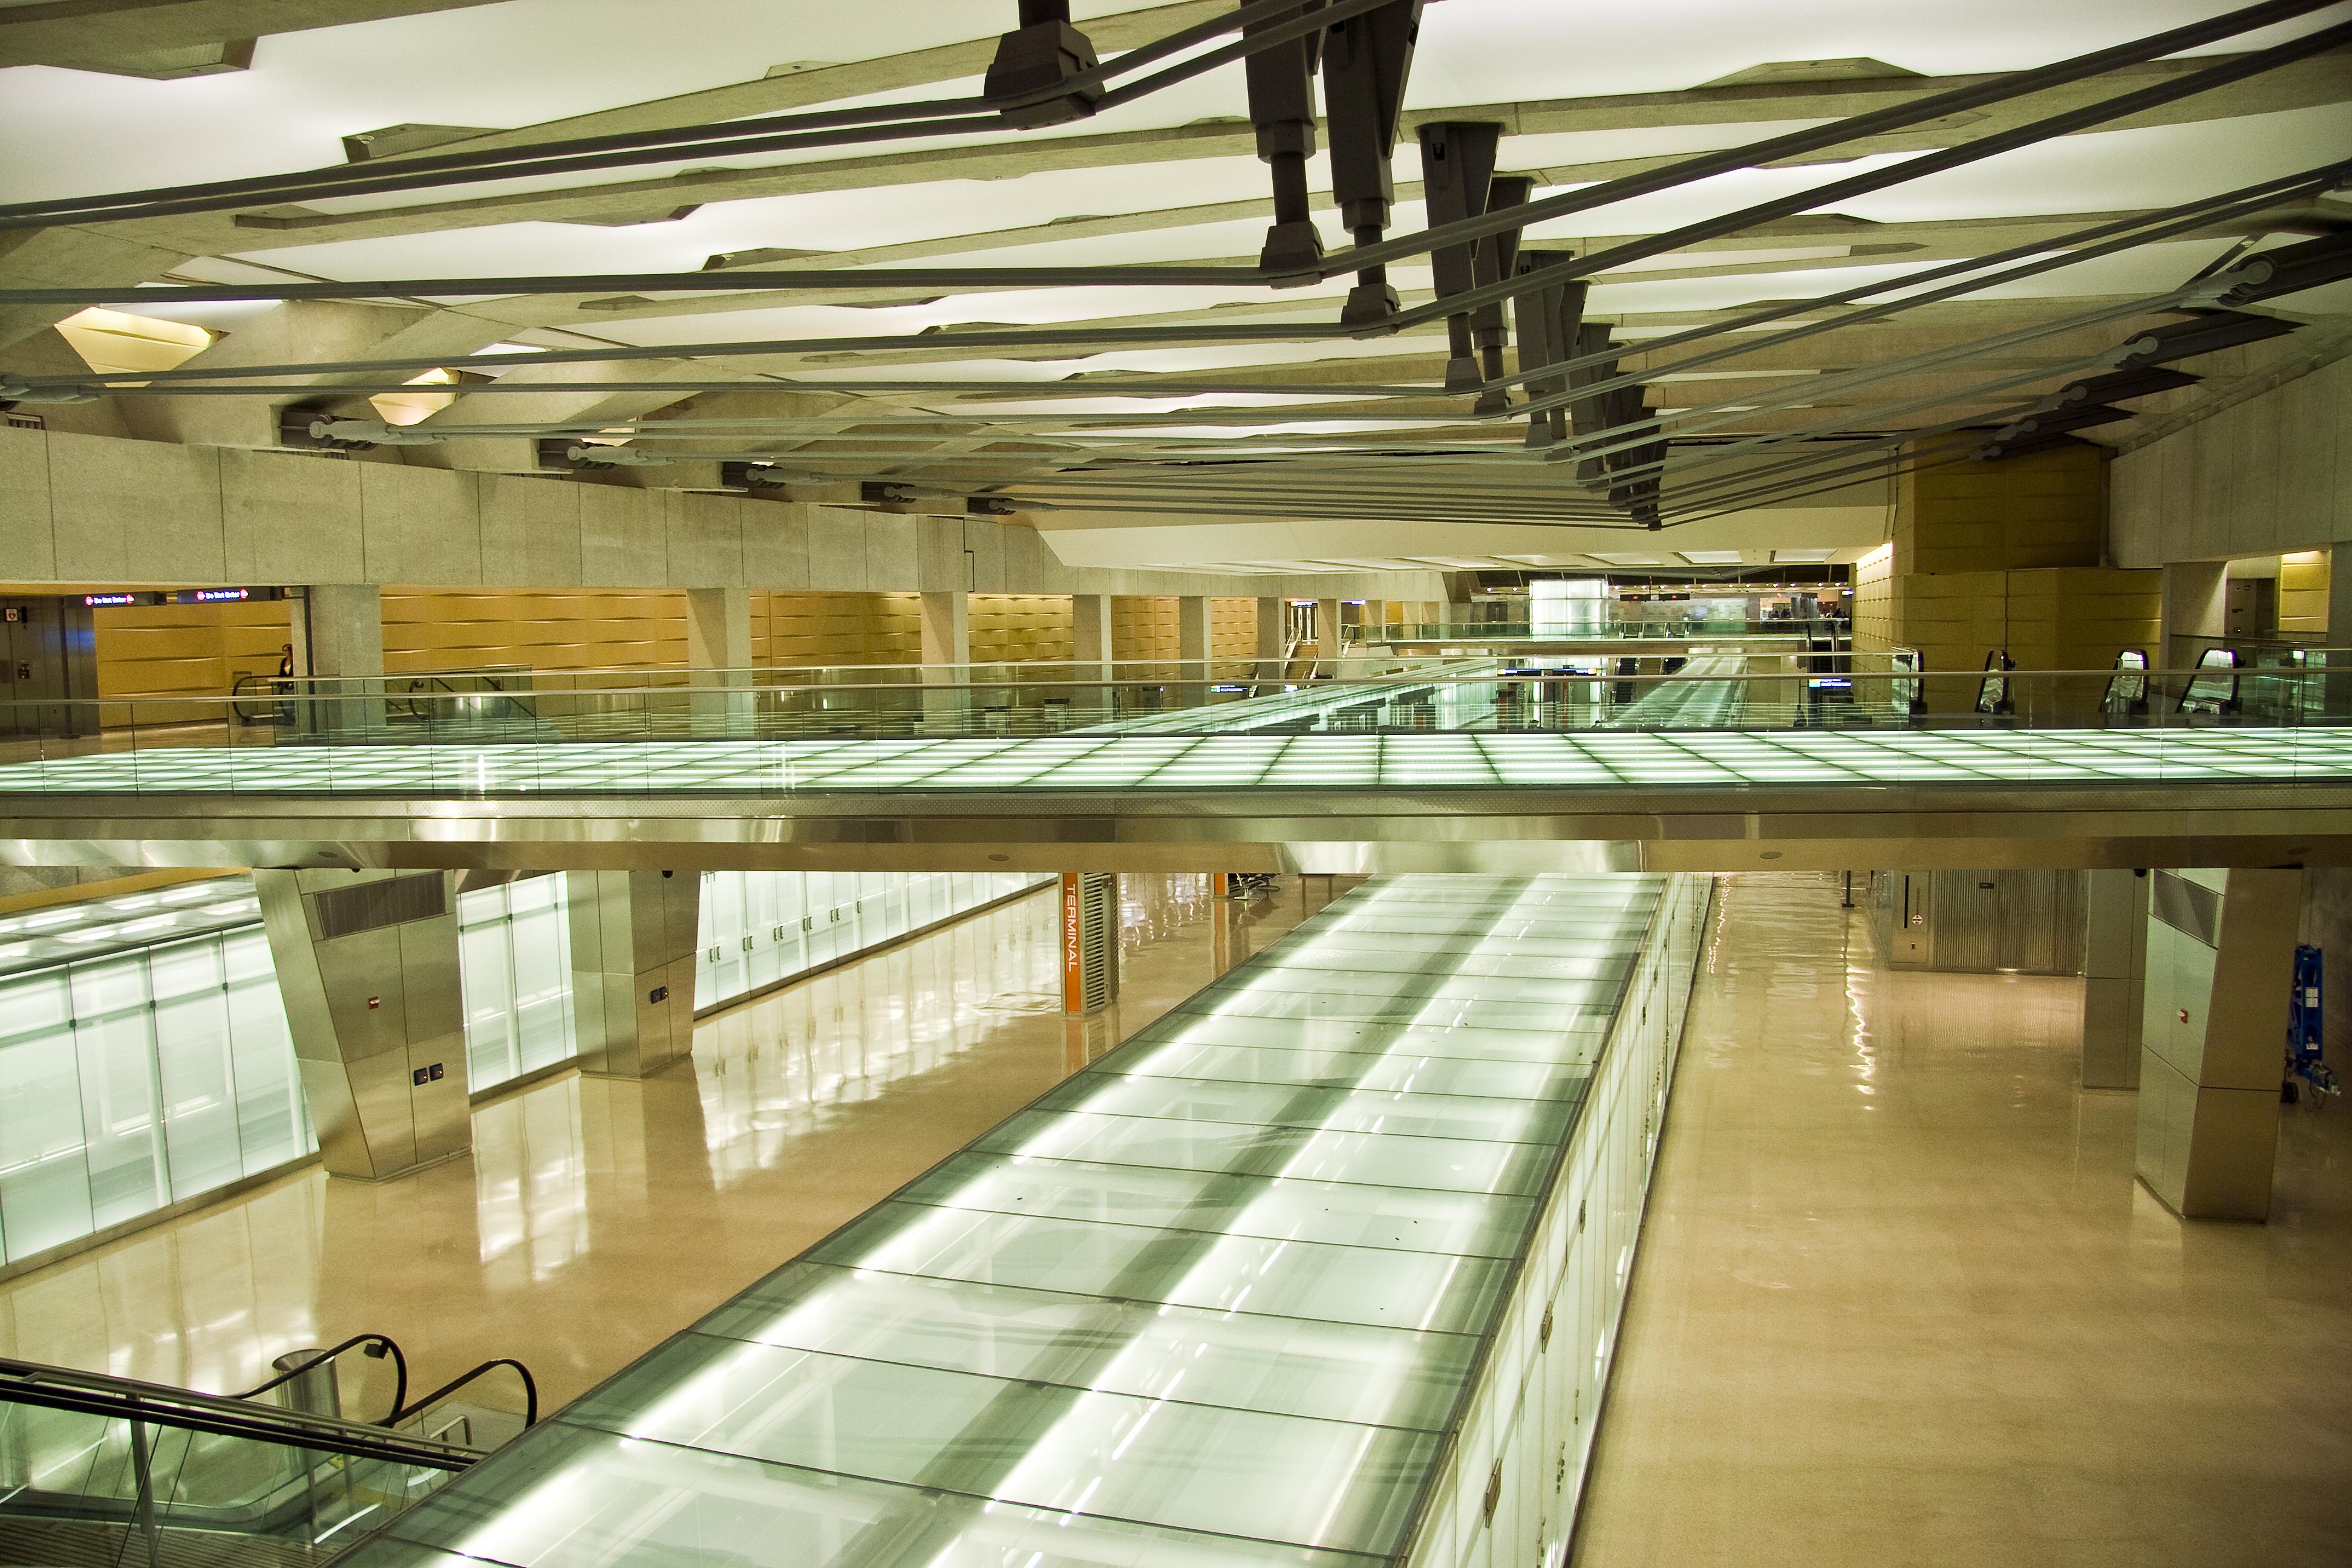 Aerotrain station Washington Dulles International Airport